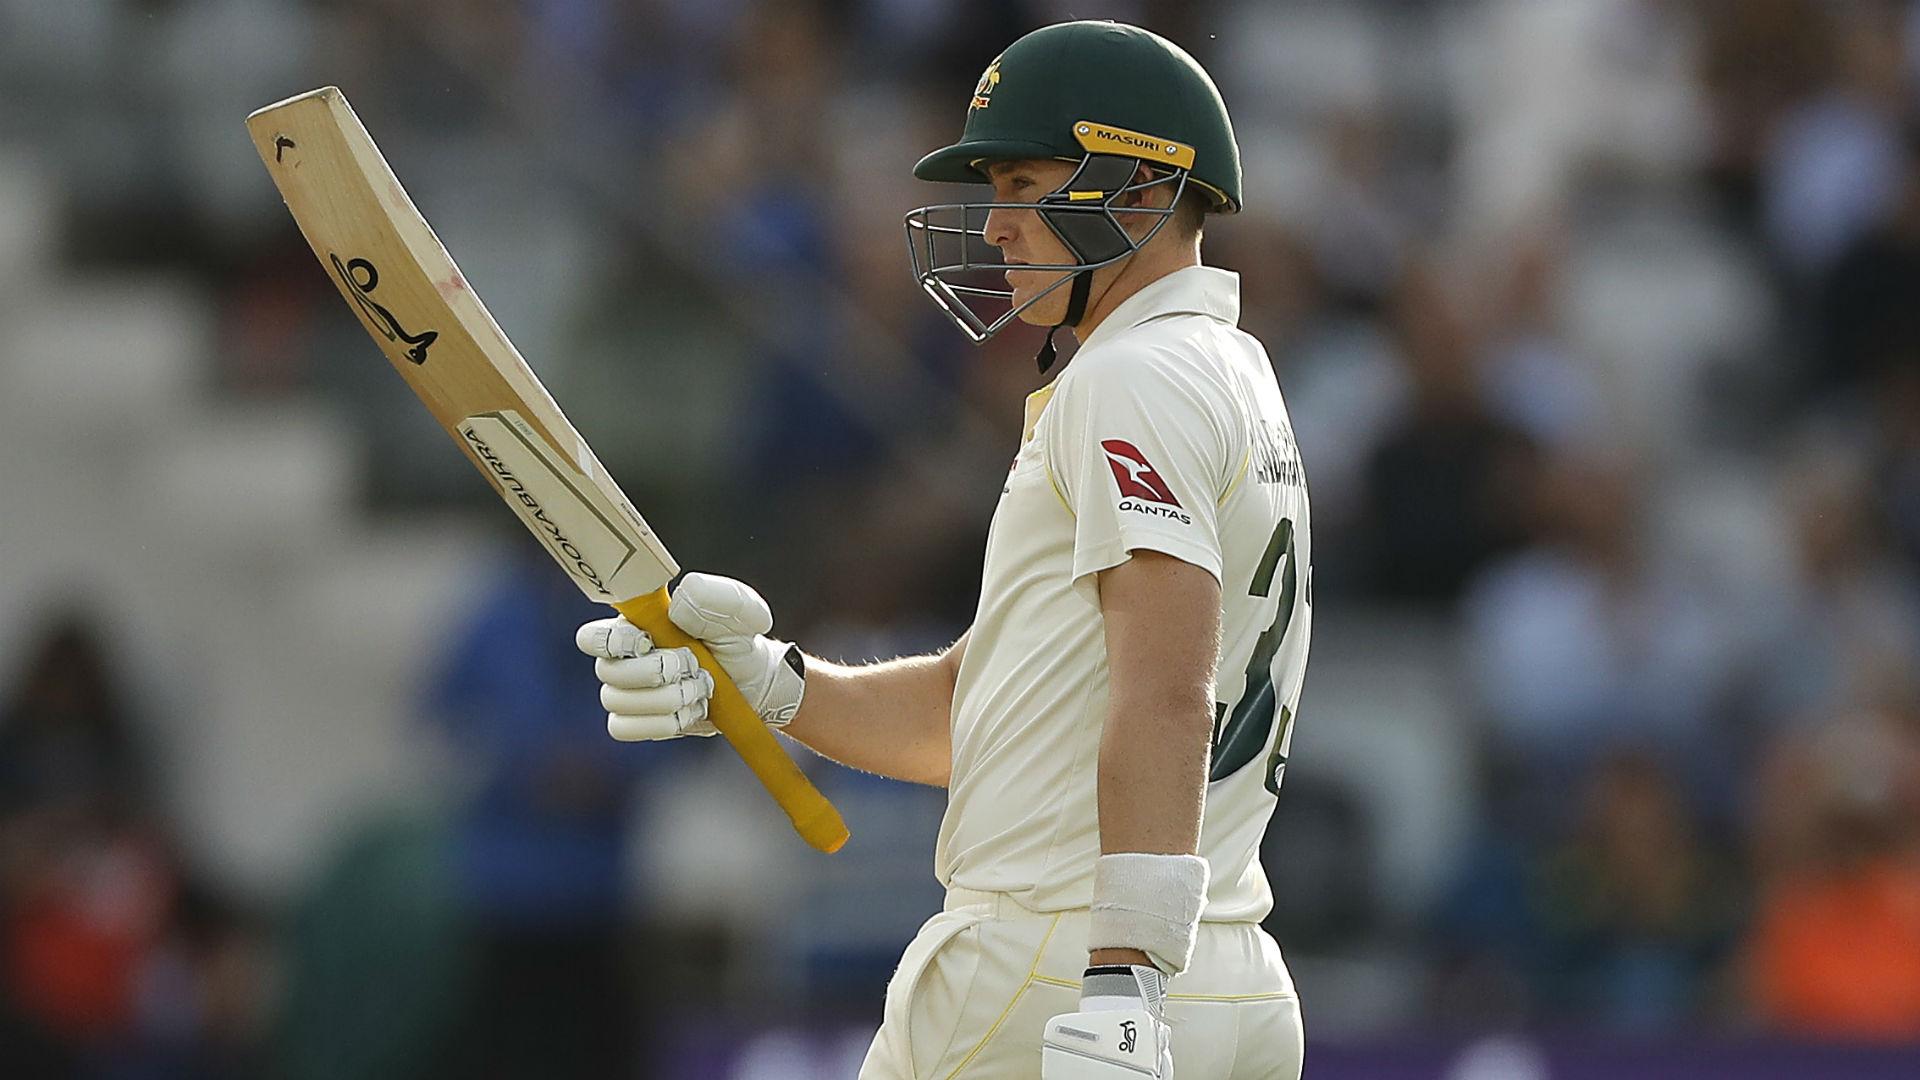 Ashes 2019: Paine hails Labuschagne as Australia claim draw to retain series advantage